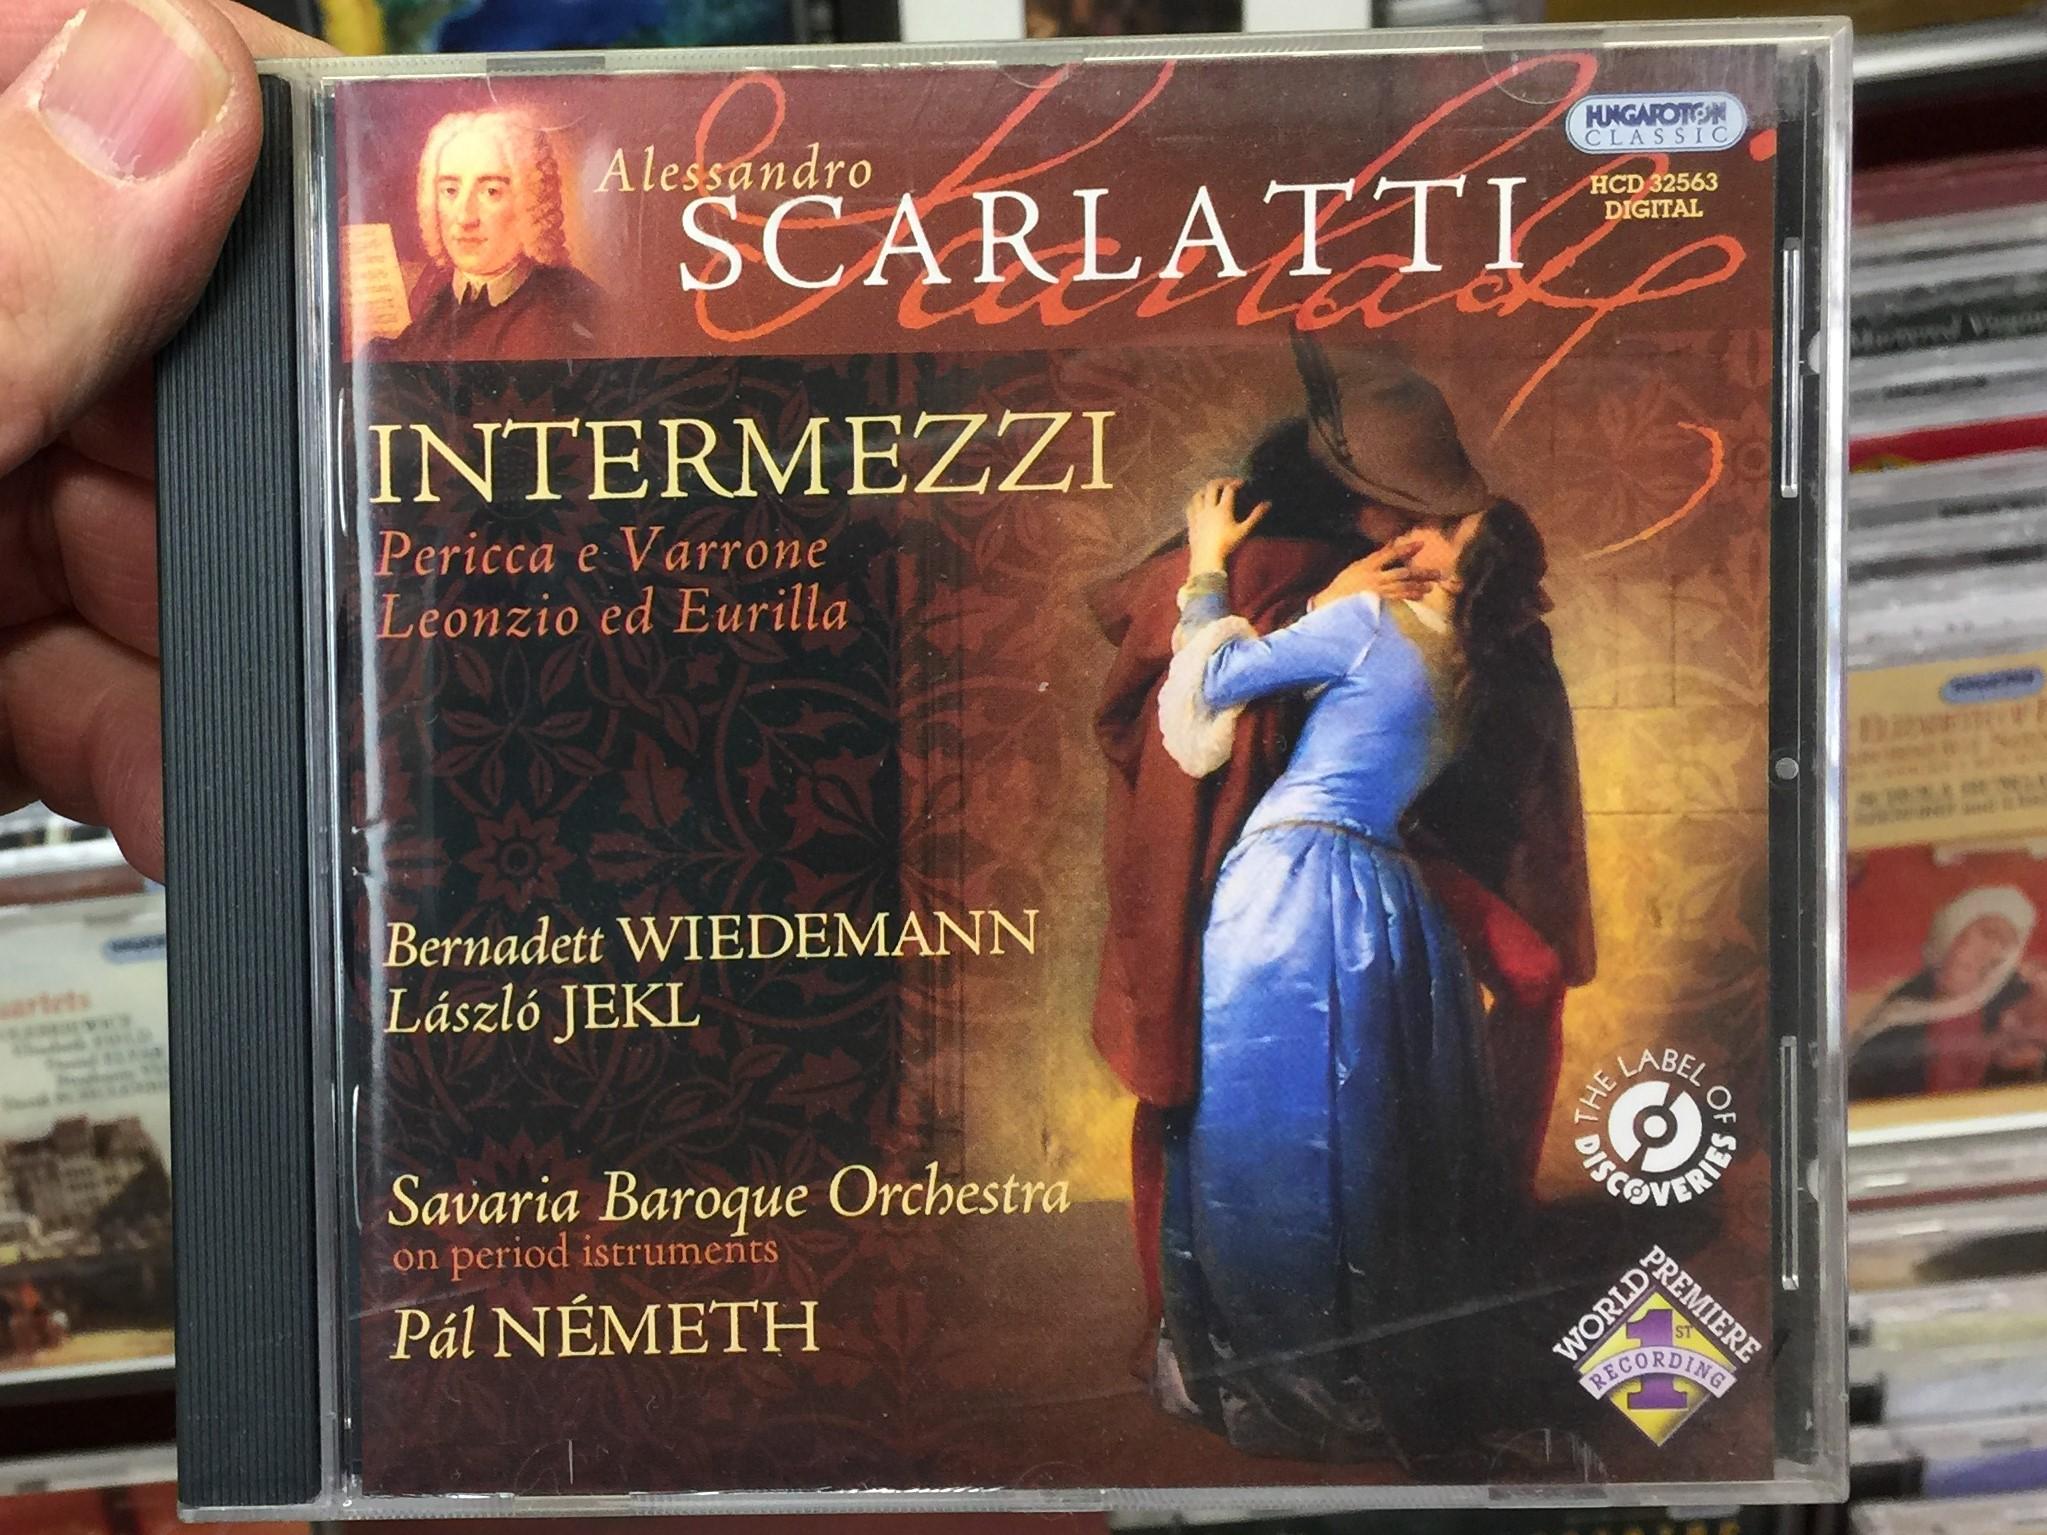 alessandro-scarlatti-intermezzi-pericca-e-varrone-leonzio-ed-eurilla-bernadett-wiedemann-laszlo-jekl-savaria-baroque-orchestra-on-period-instruments-pal-nemeth-hungaroton-classic-audio-cd-2-1-.jpg